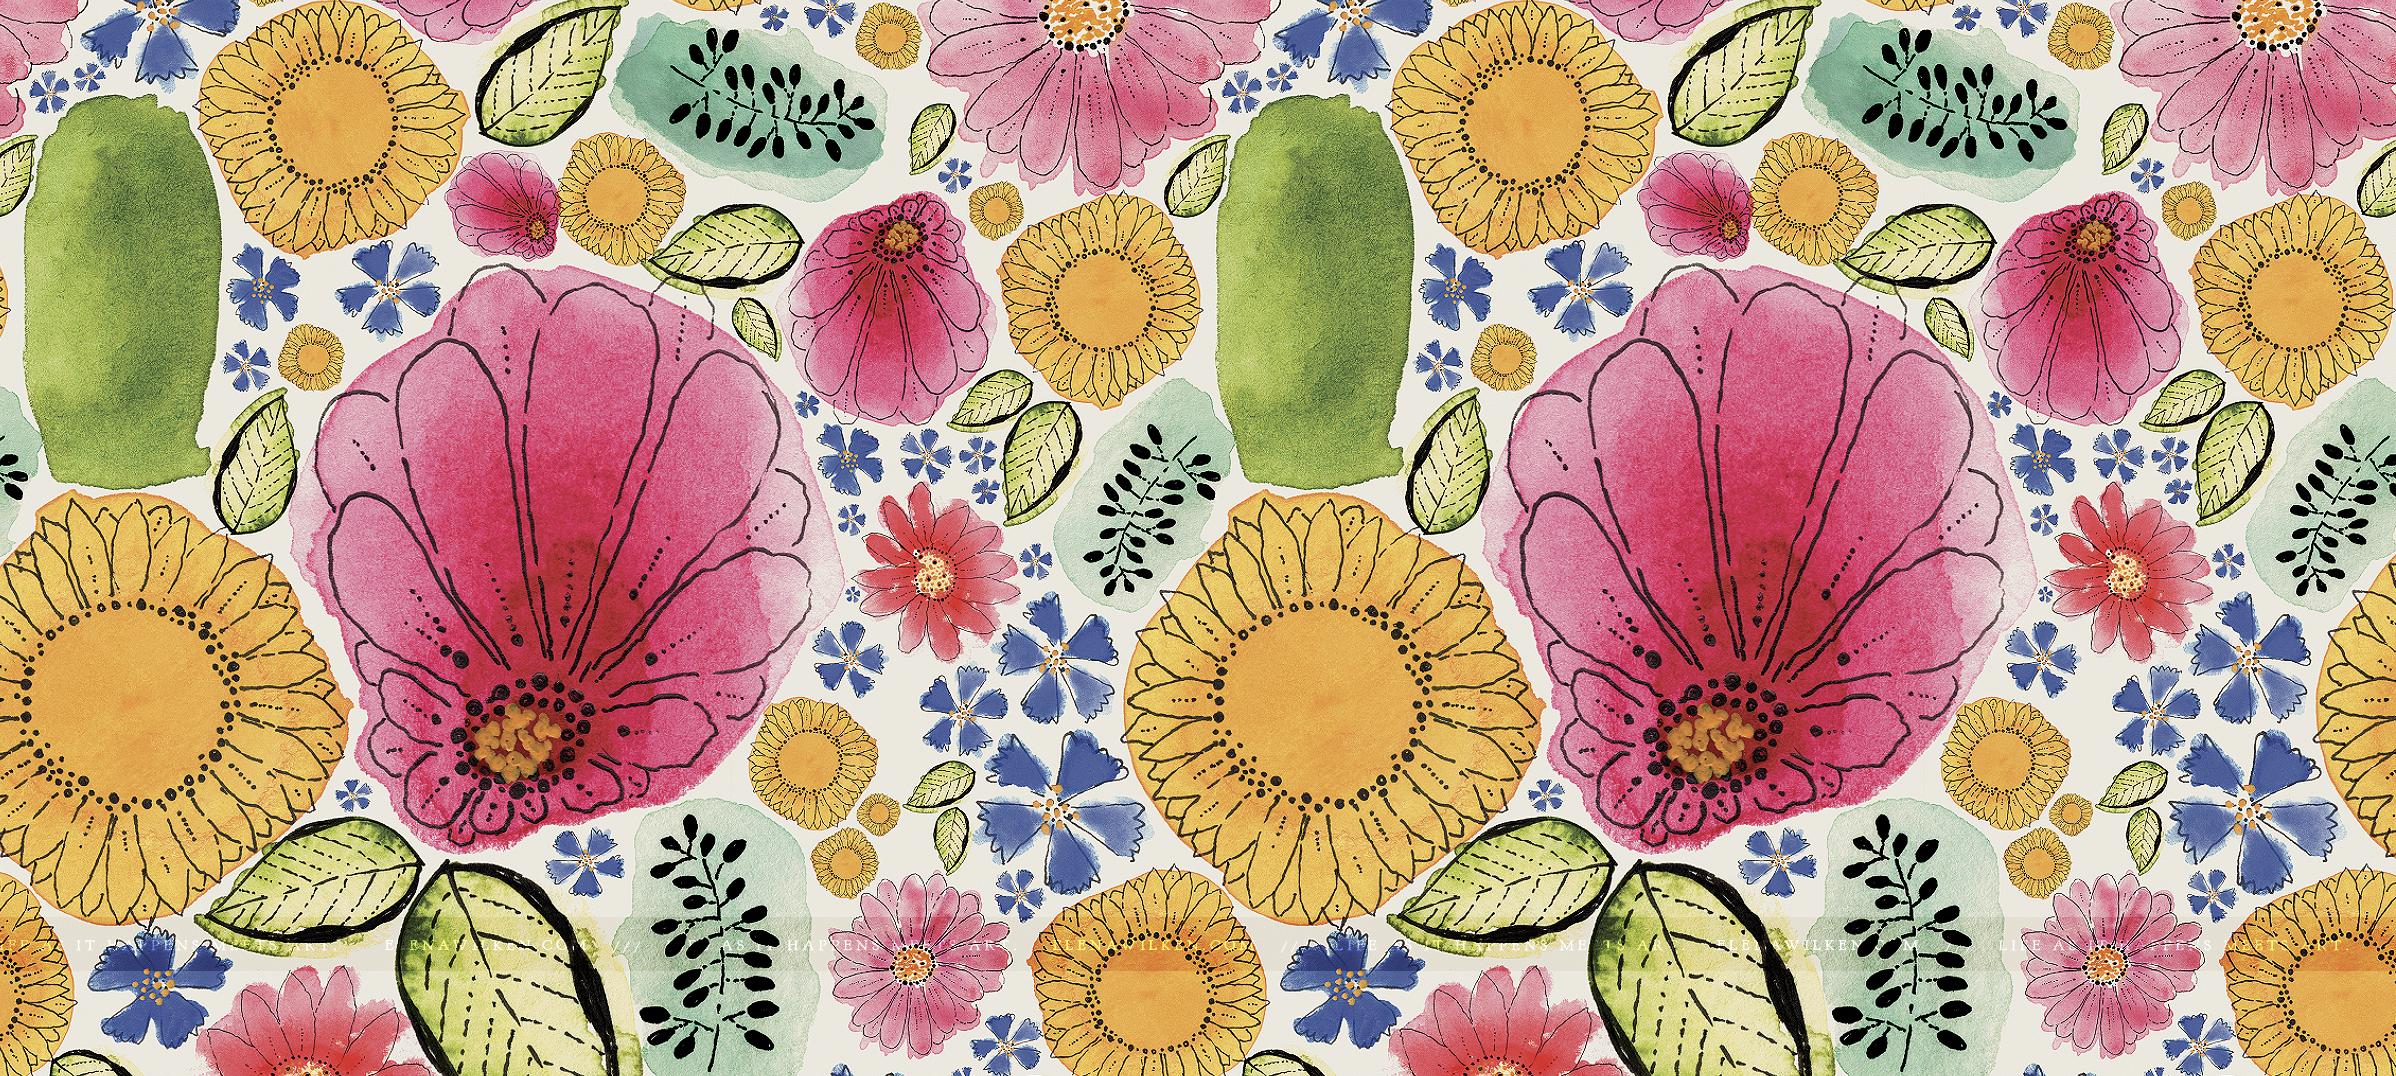 elena-wilken-whimsical-watercolor-fields-surface-pattern-design1.png